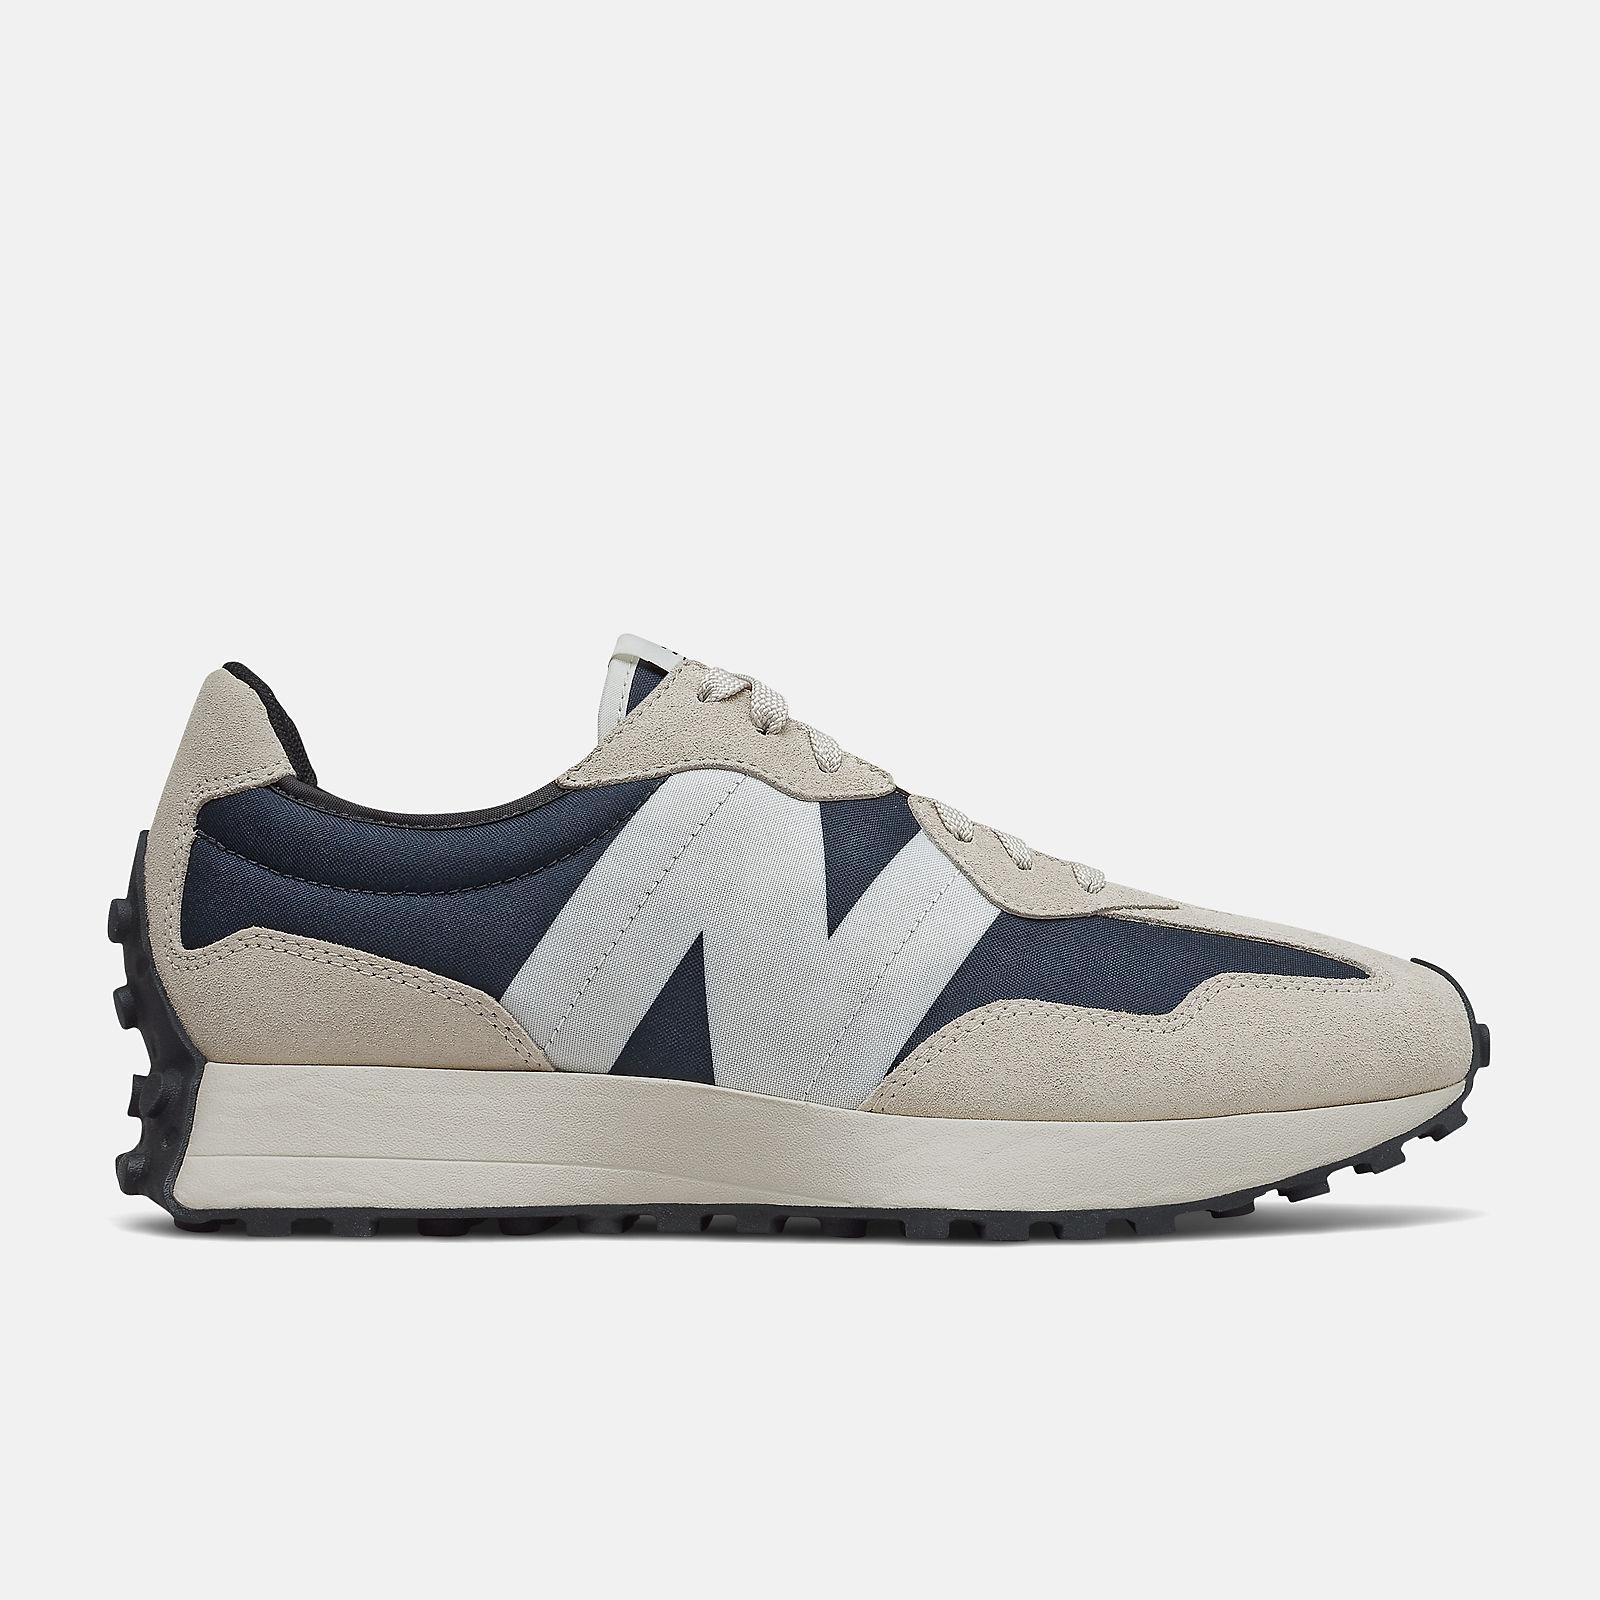 327 - New Balance